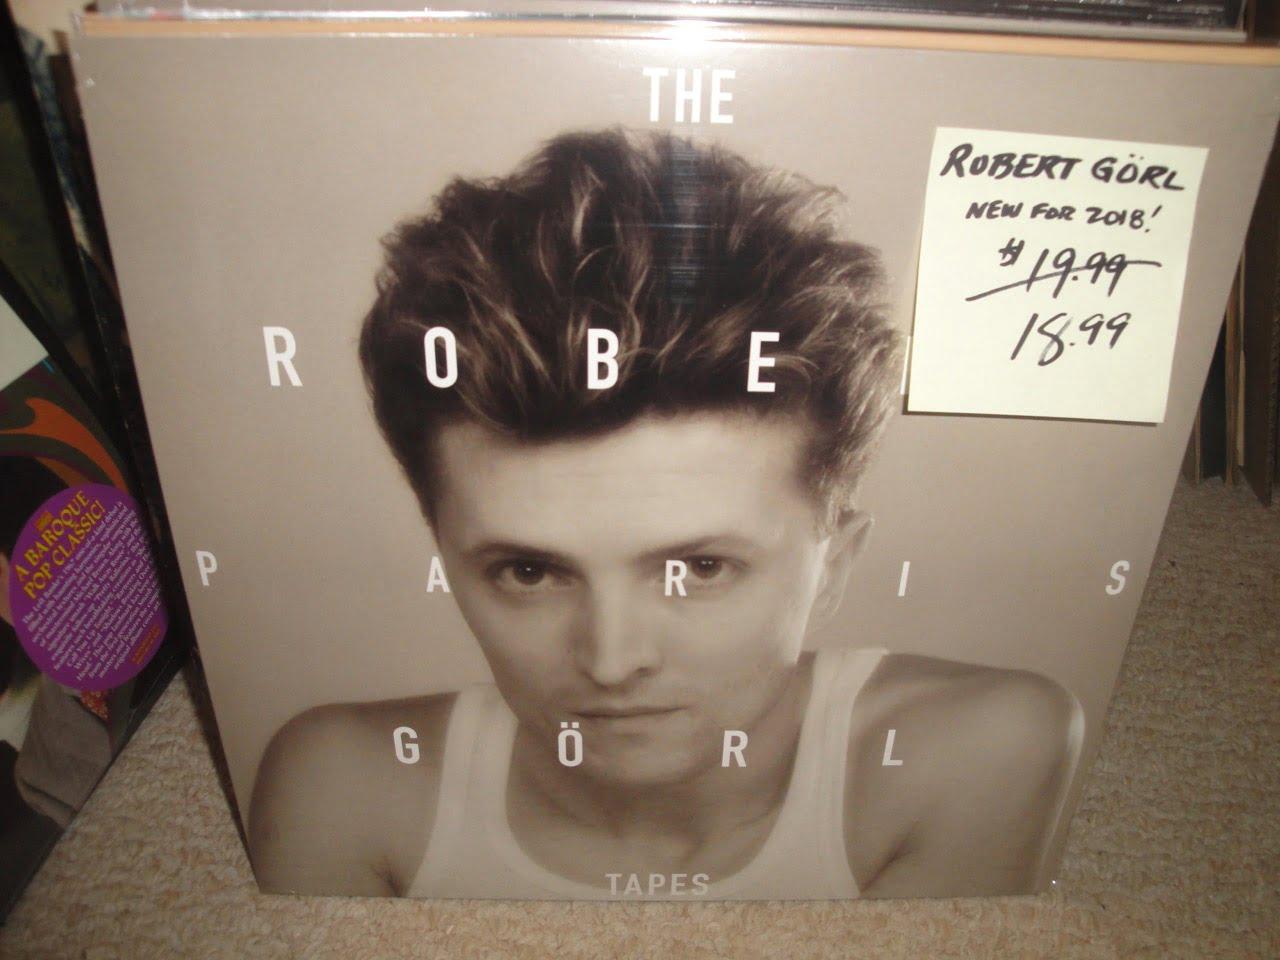 Robert Görl - The Paris Tapes - Vinyl, LP, DAF, Groenland, 2018